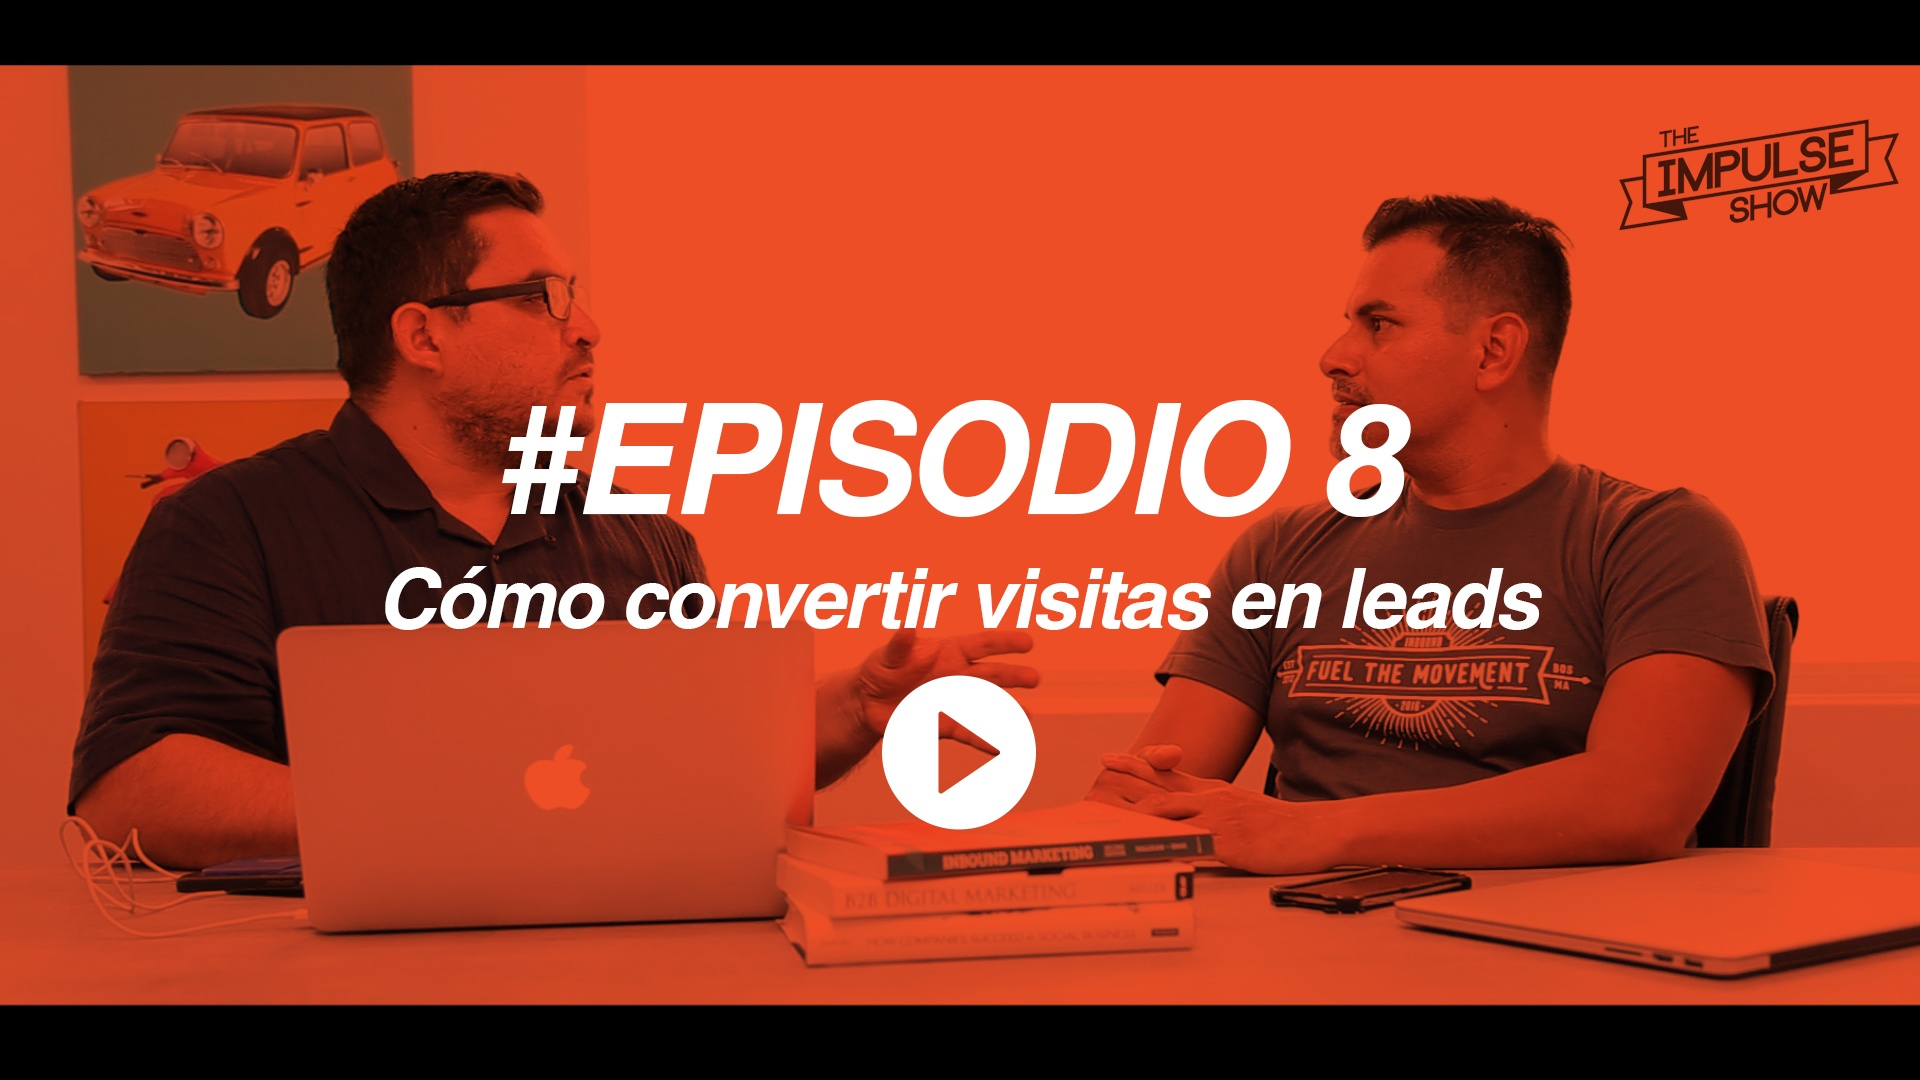 #TheImpulseShow Ep 8: ¿Cómo convertir visitas en leads?